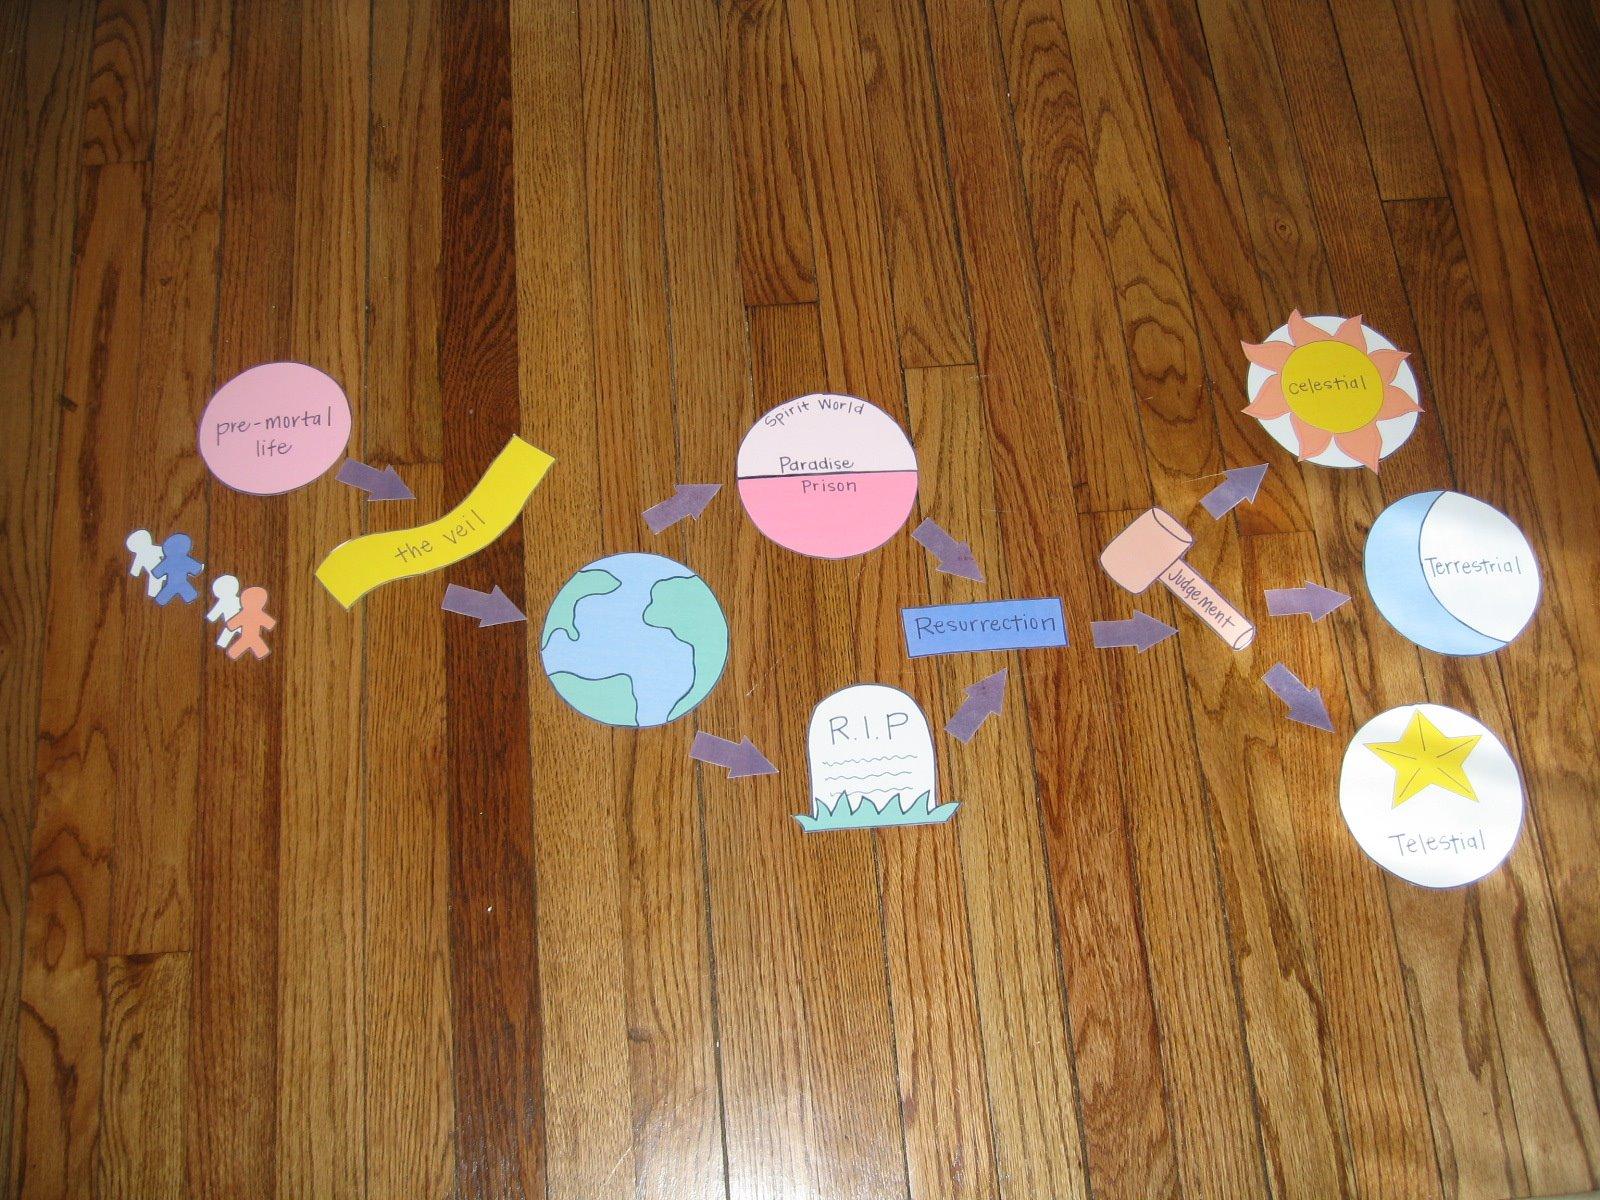 Cookie nut creations plan of salvation diagram plan of salvation diagram 42312 pooptronica